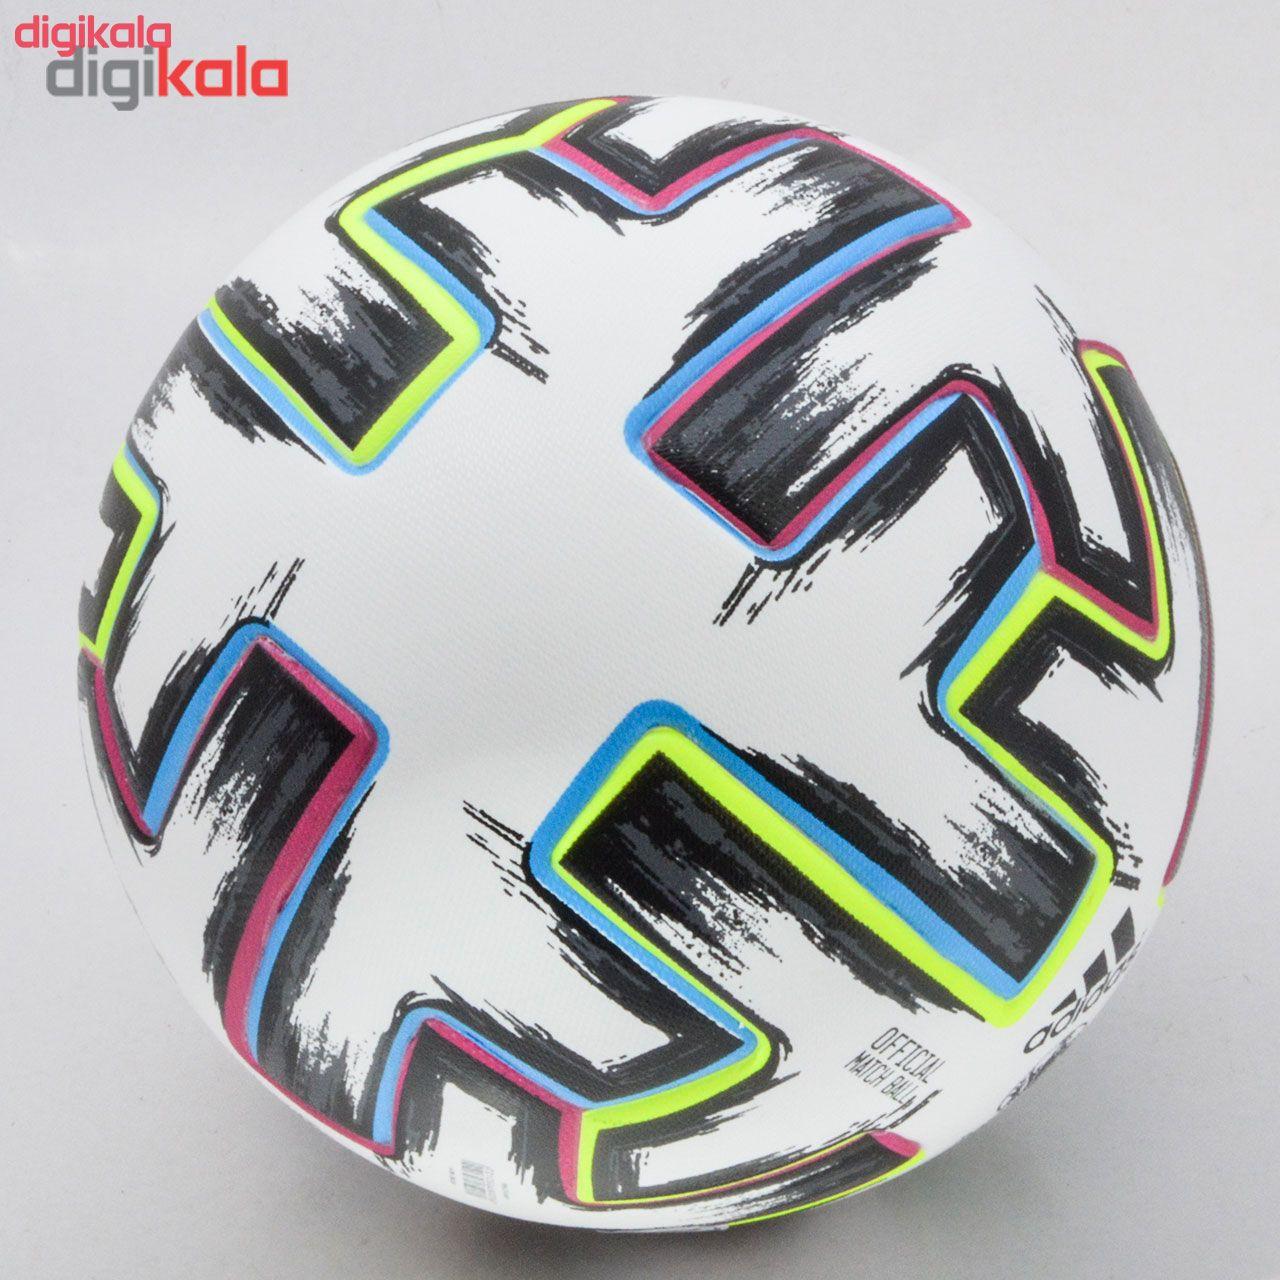 توپ فوتبال مدل R5110 main 1 1